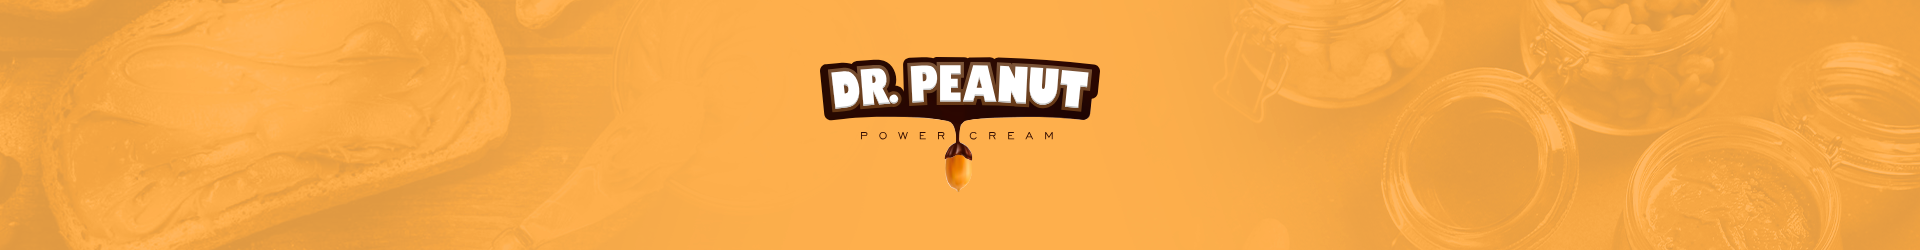 MARCA - Dr. Peanut